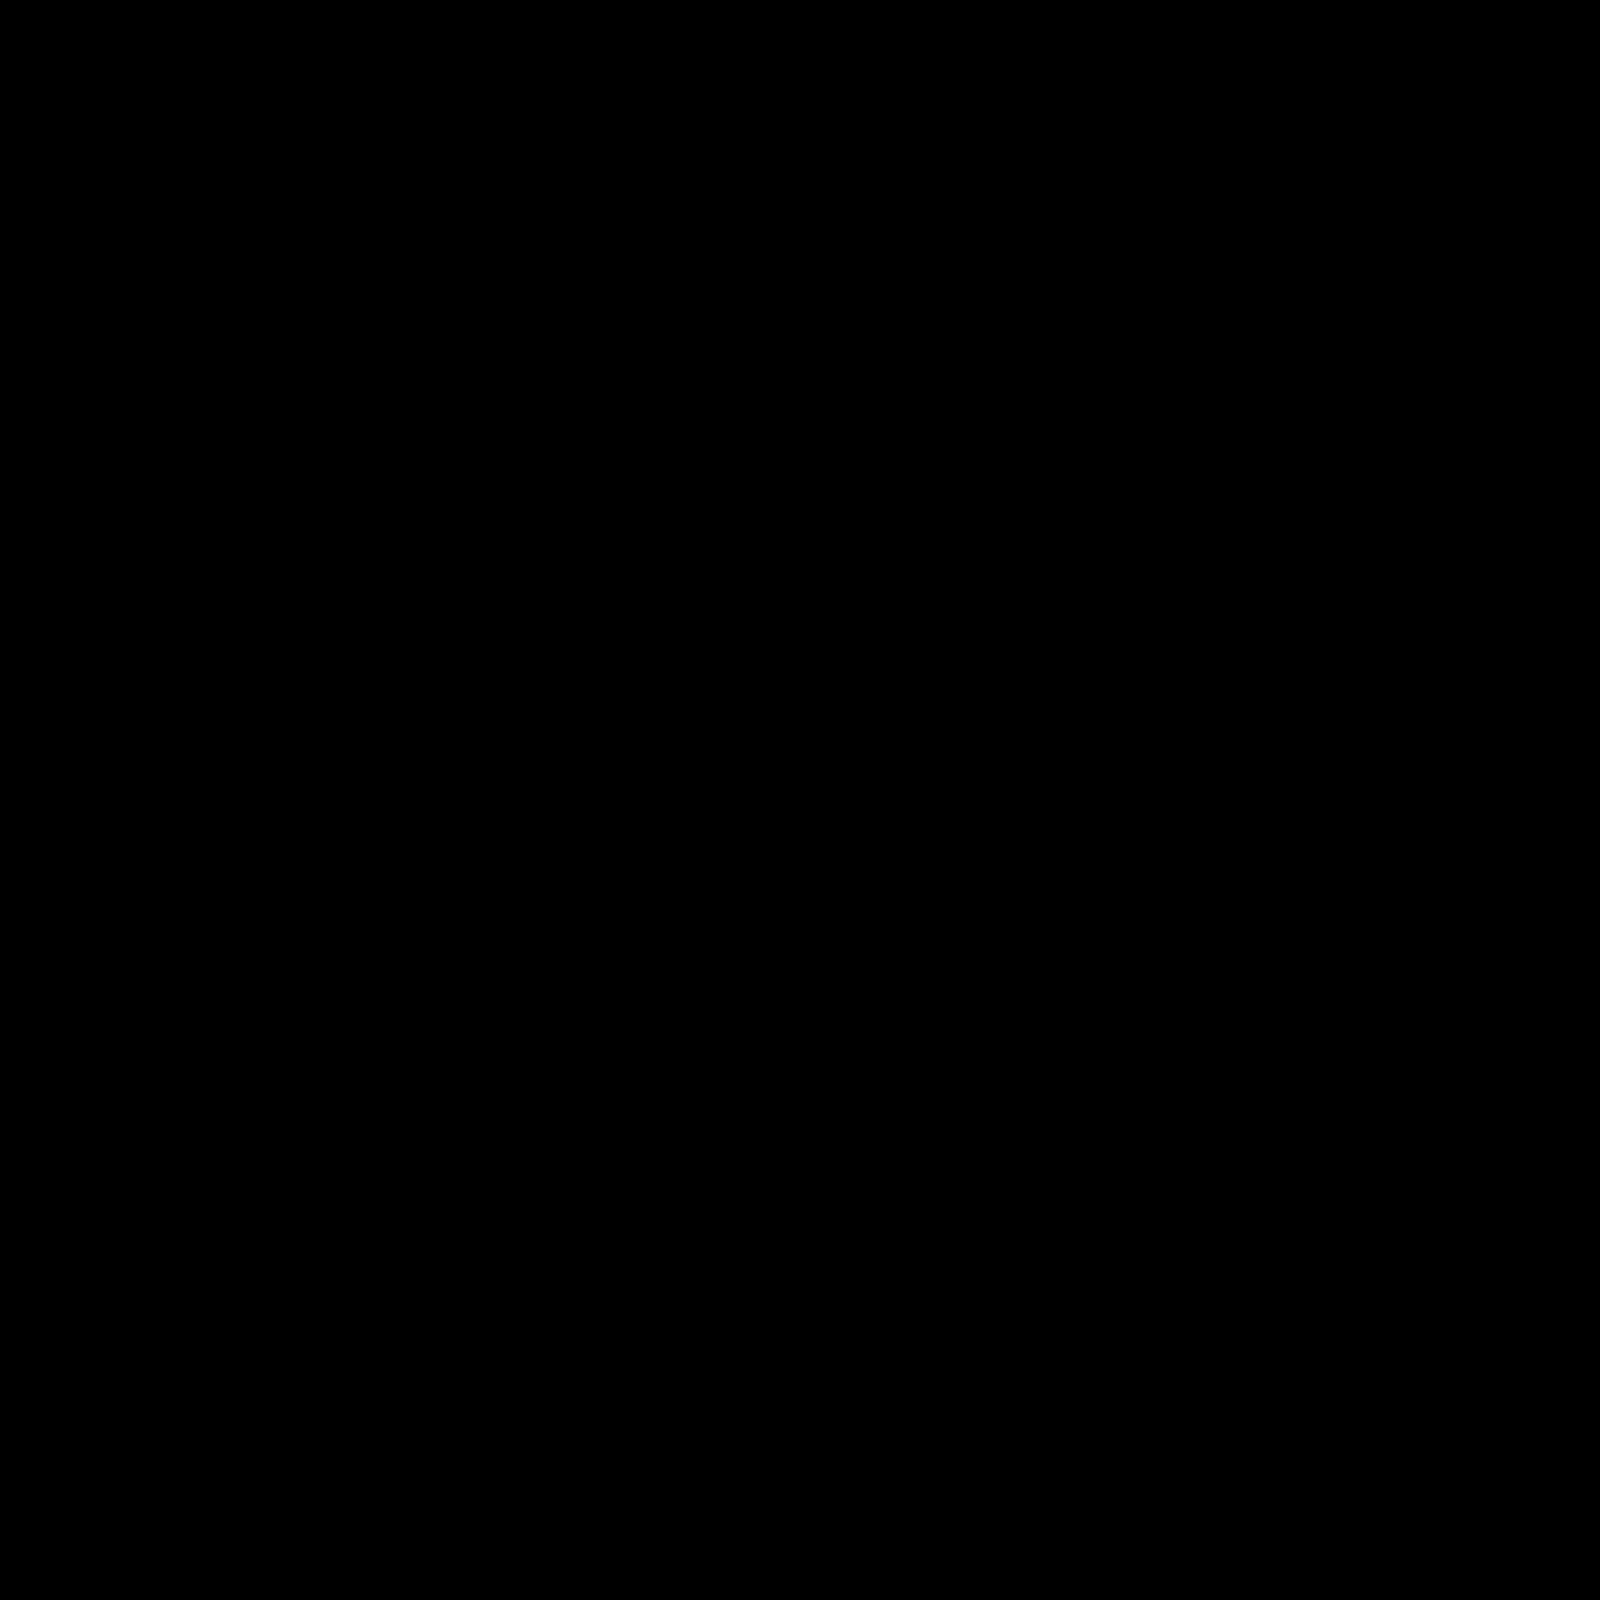 Ultradźwięk icon